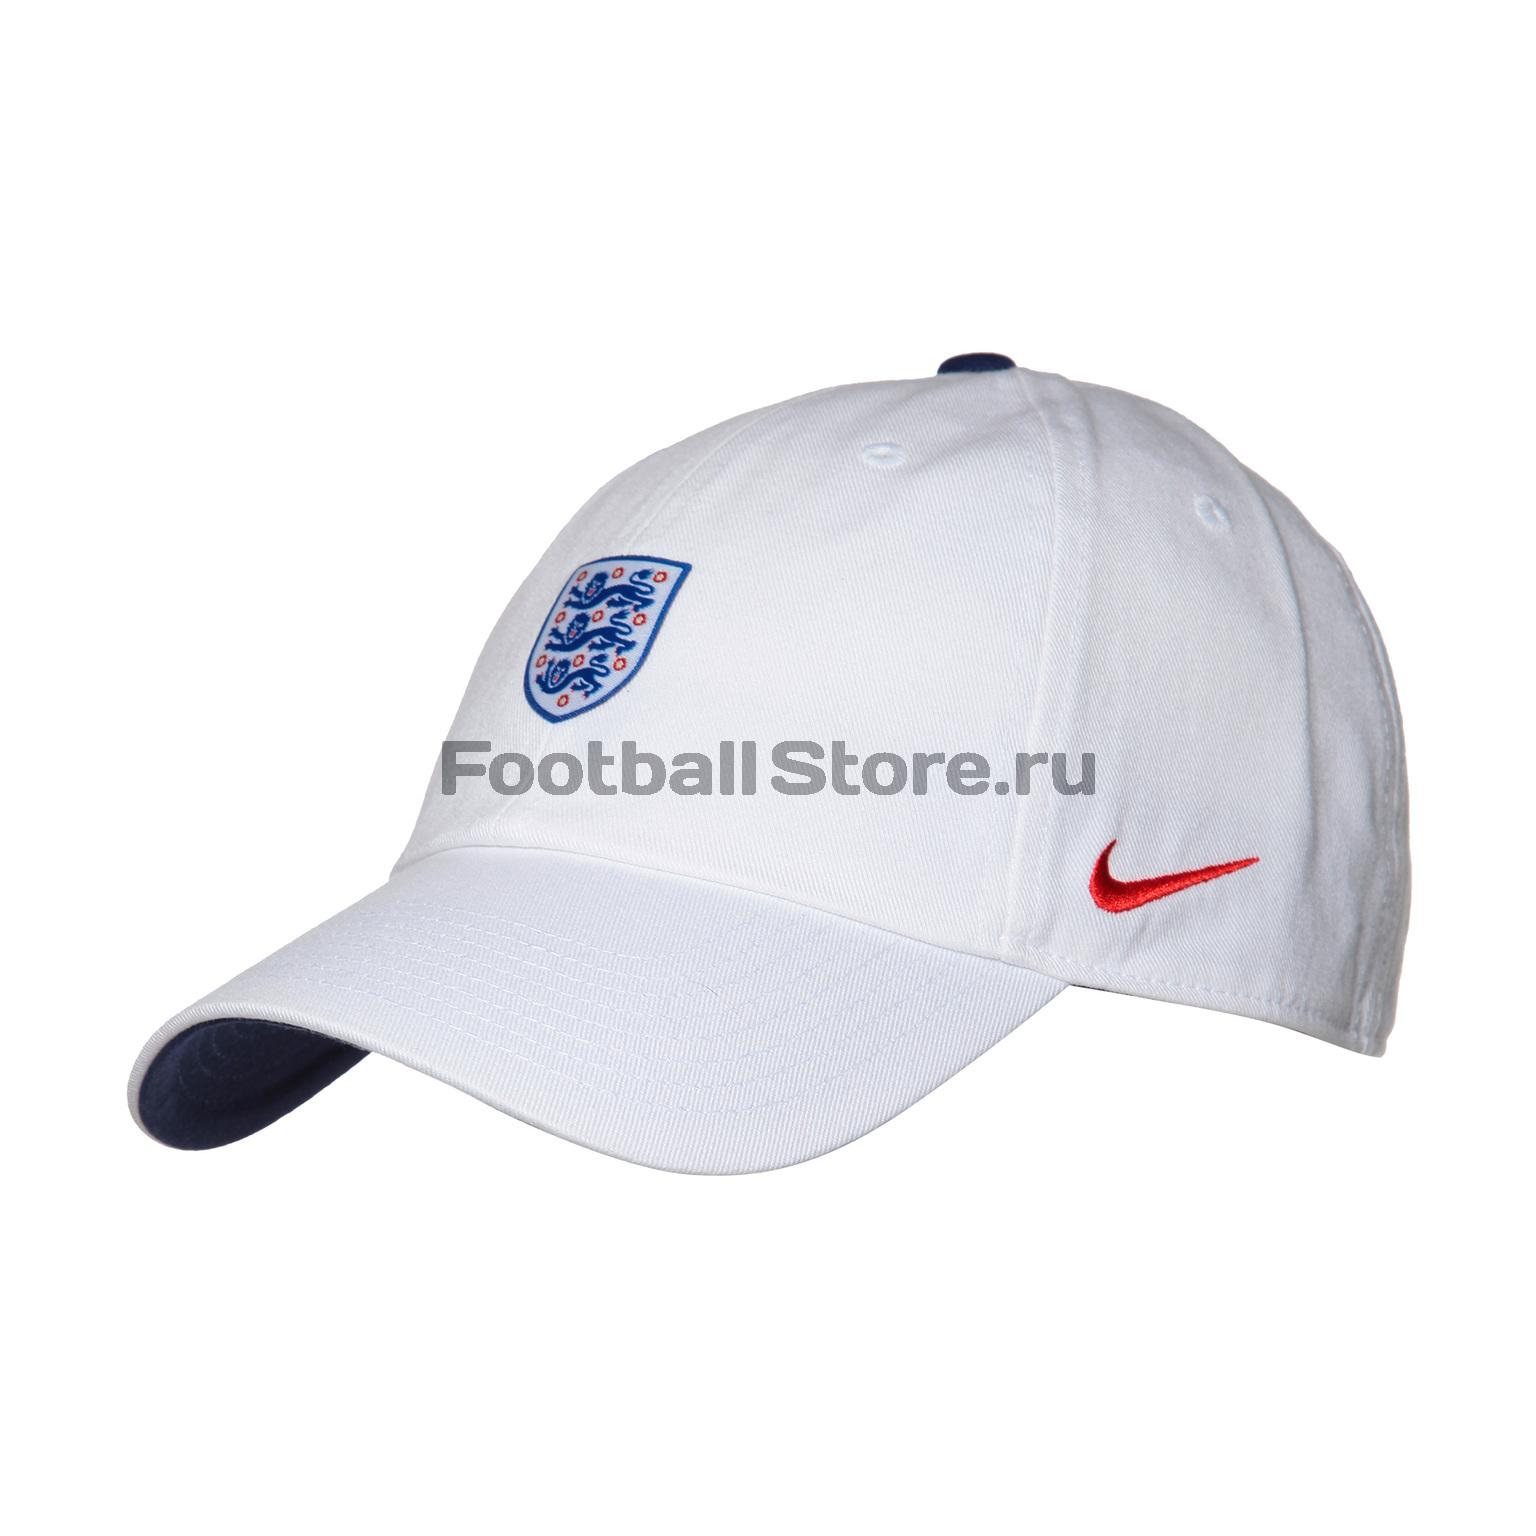 Бейсболка Nike England Cap 881712-101